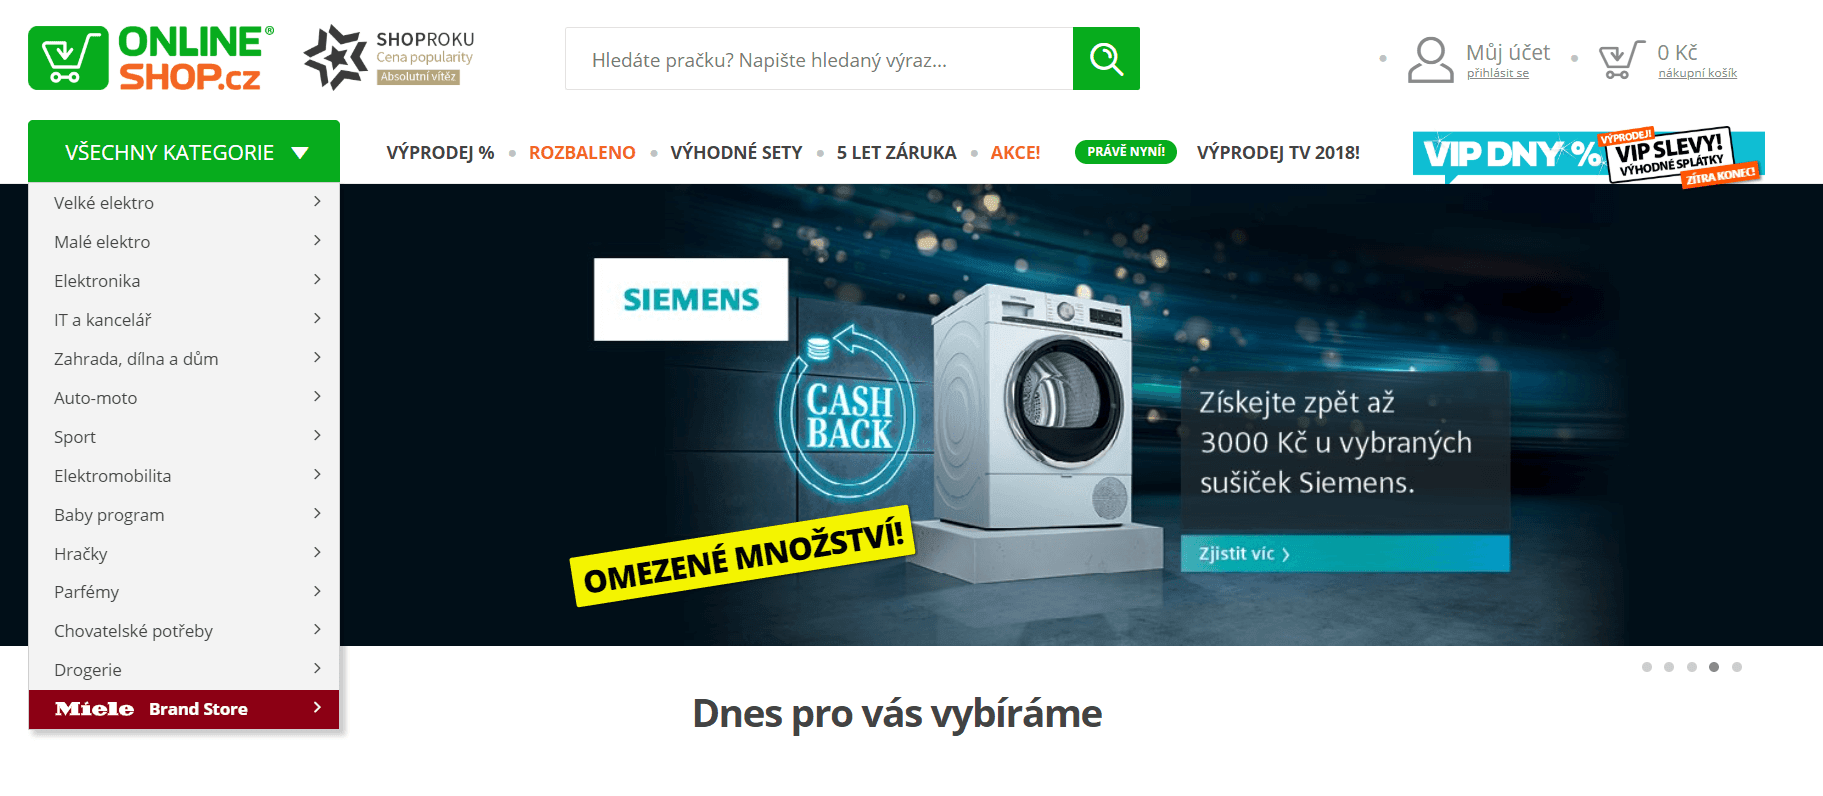 Online Shop купити онлайн з доставкою в Україну - myMeest - 2